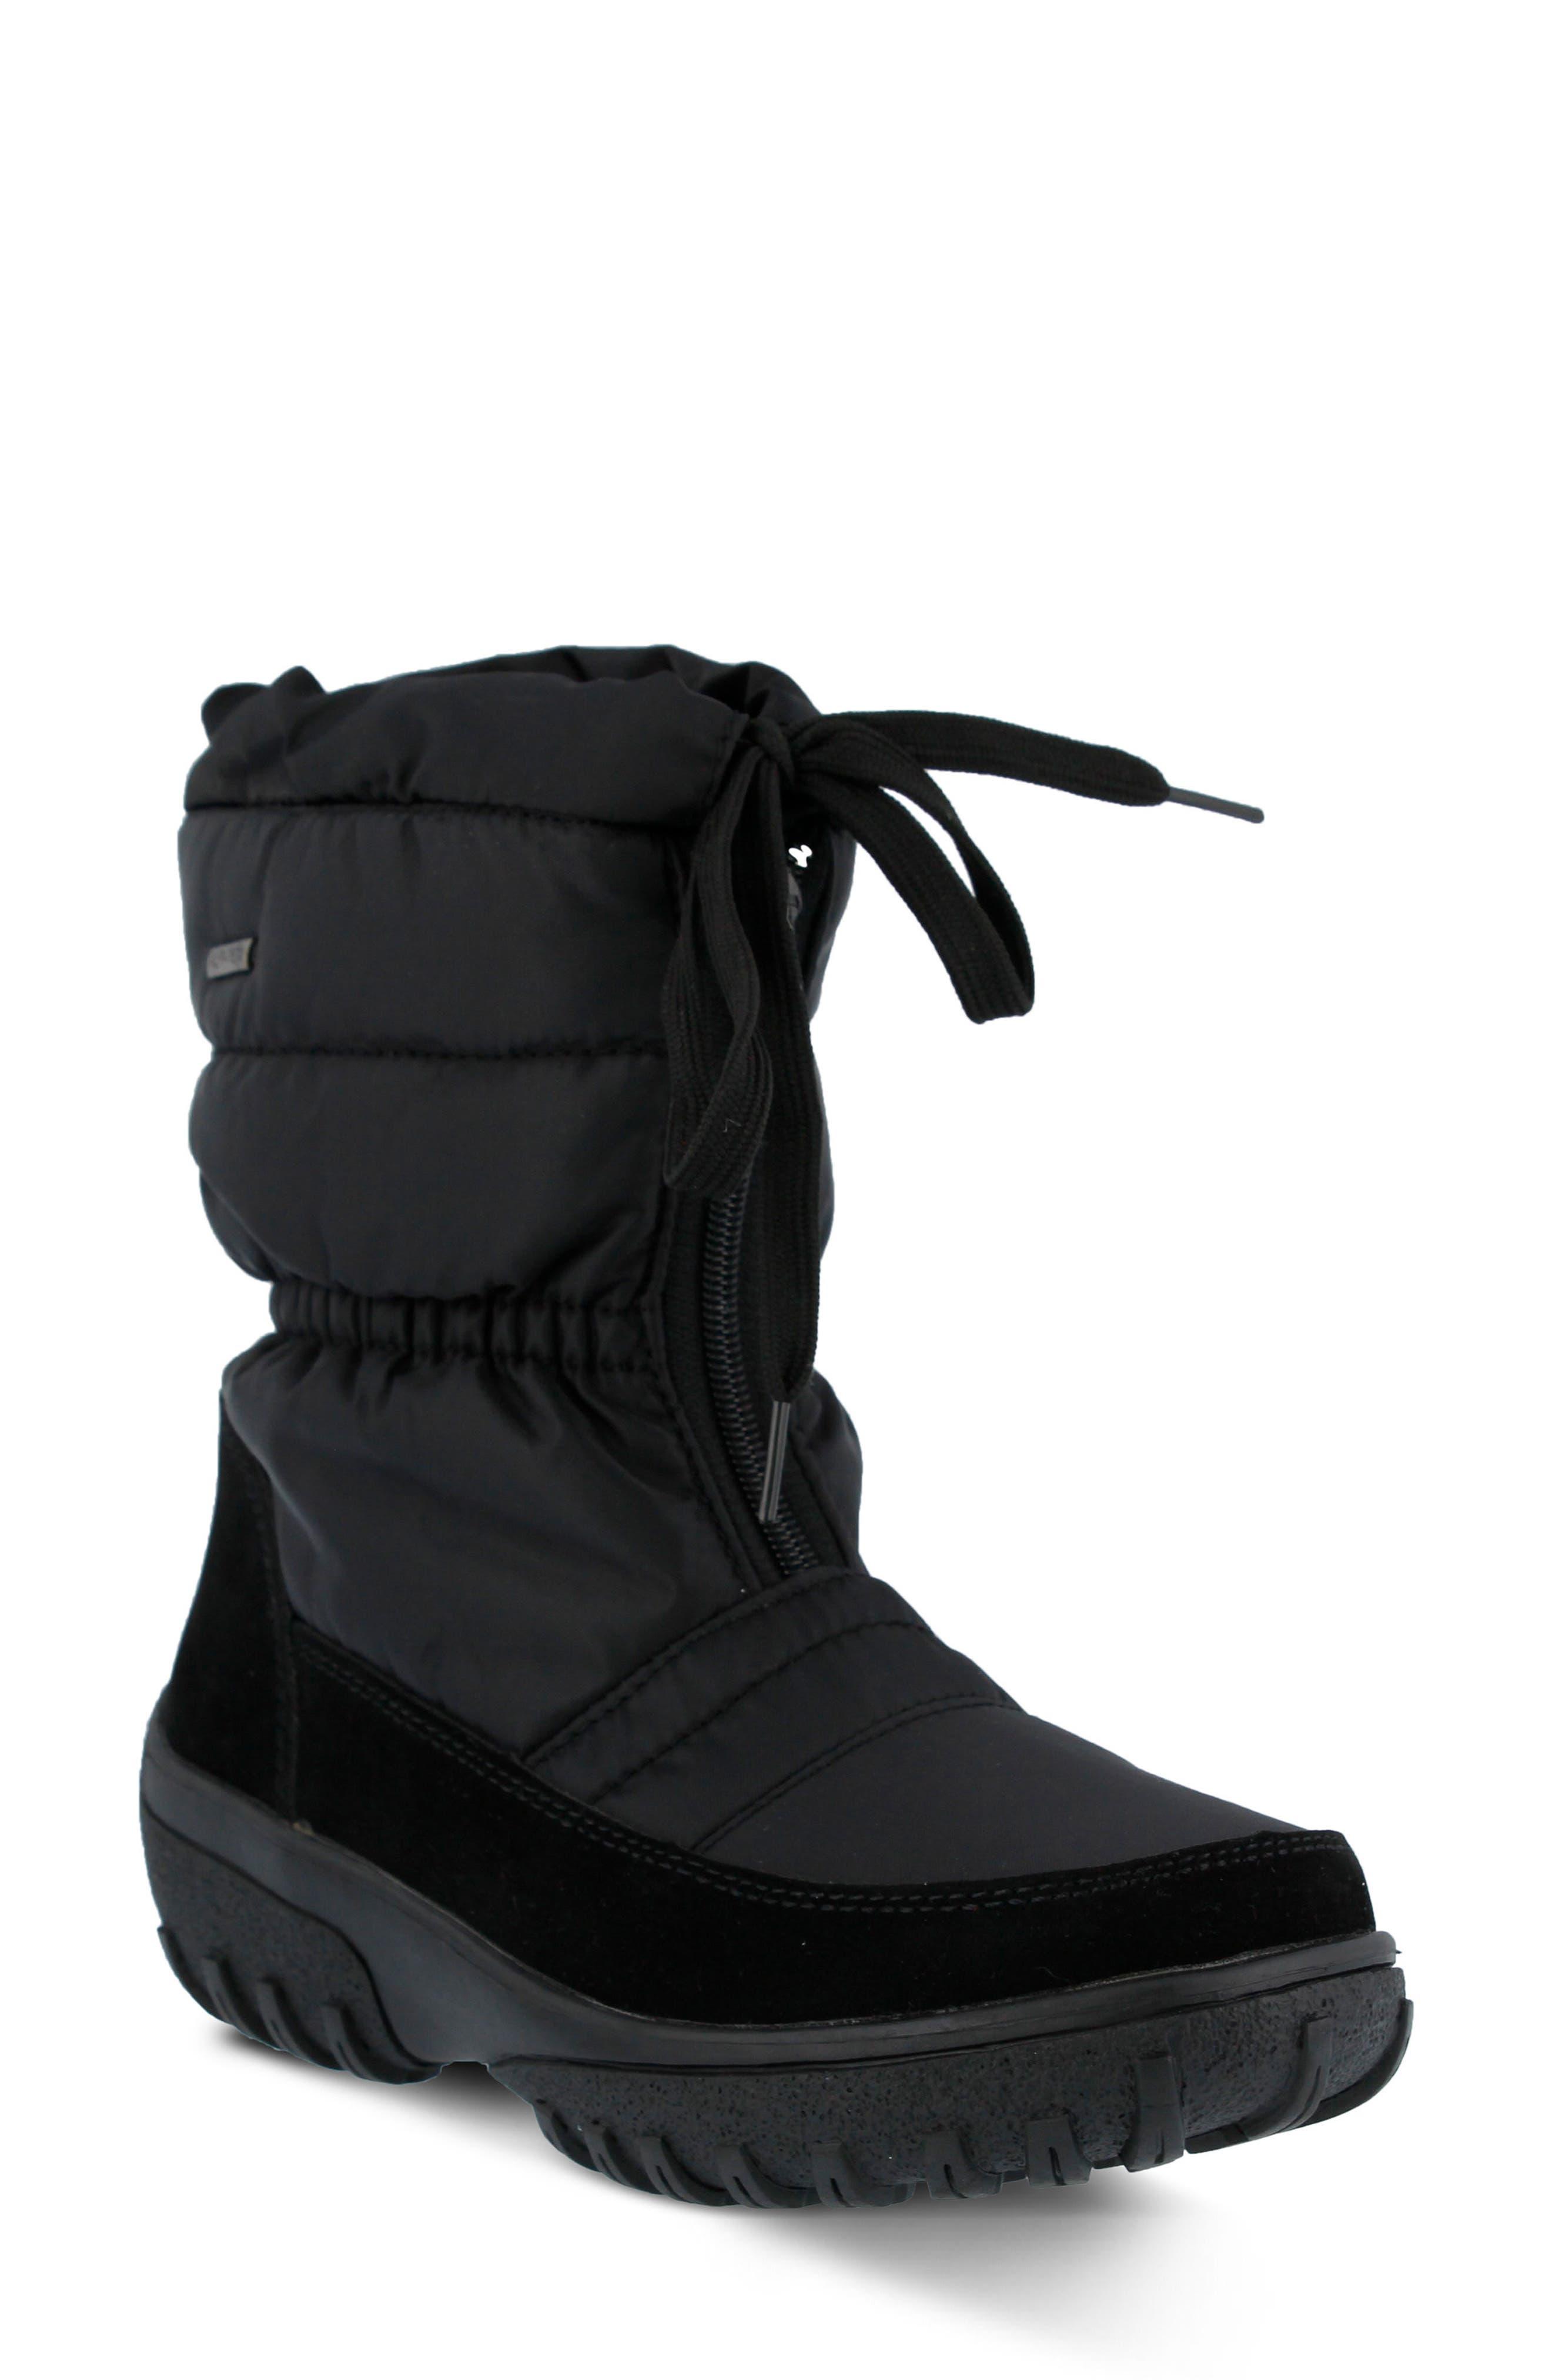 Lucerne Waterproof Drawstring Boot,                             Main thumbnail 1, color,                             Black